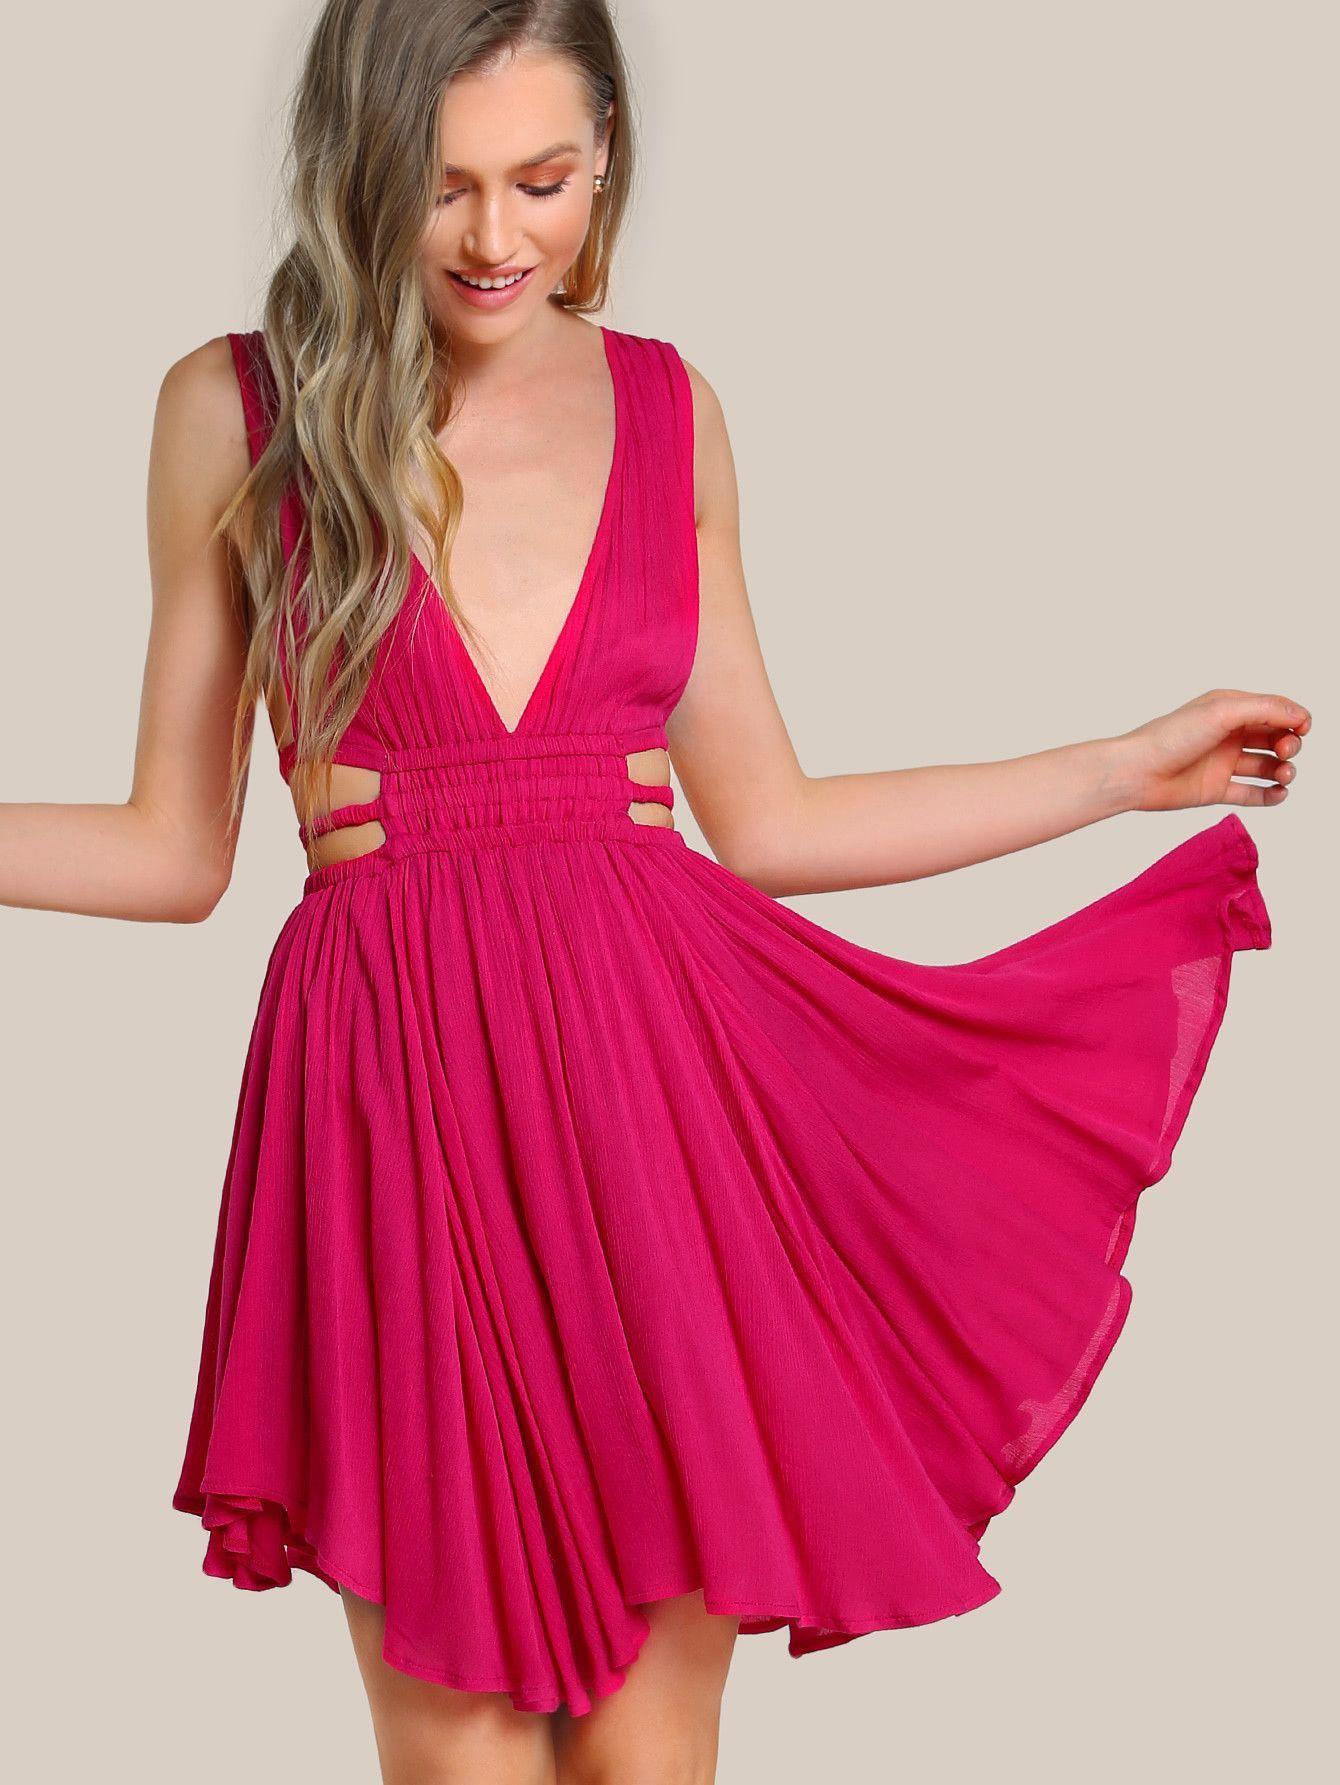 1ff0220aad62 Plain Hot Pink Double Plunge Deep V-Neck Sleeveless Shirred Strap Waist  Mini Dress